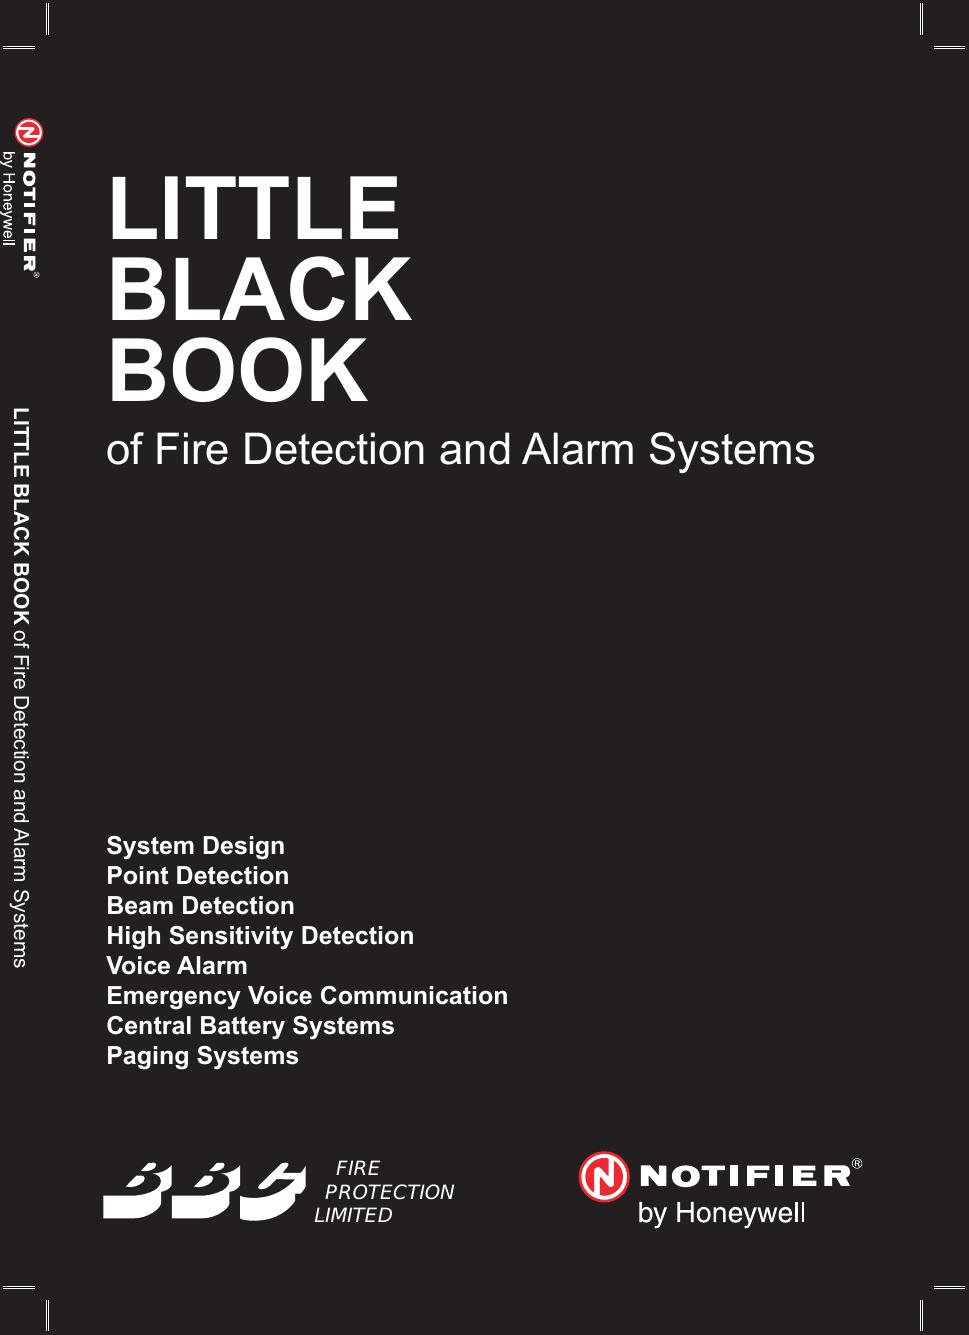 Little Black Book Bbc Fire Protection Manualzz